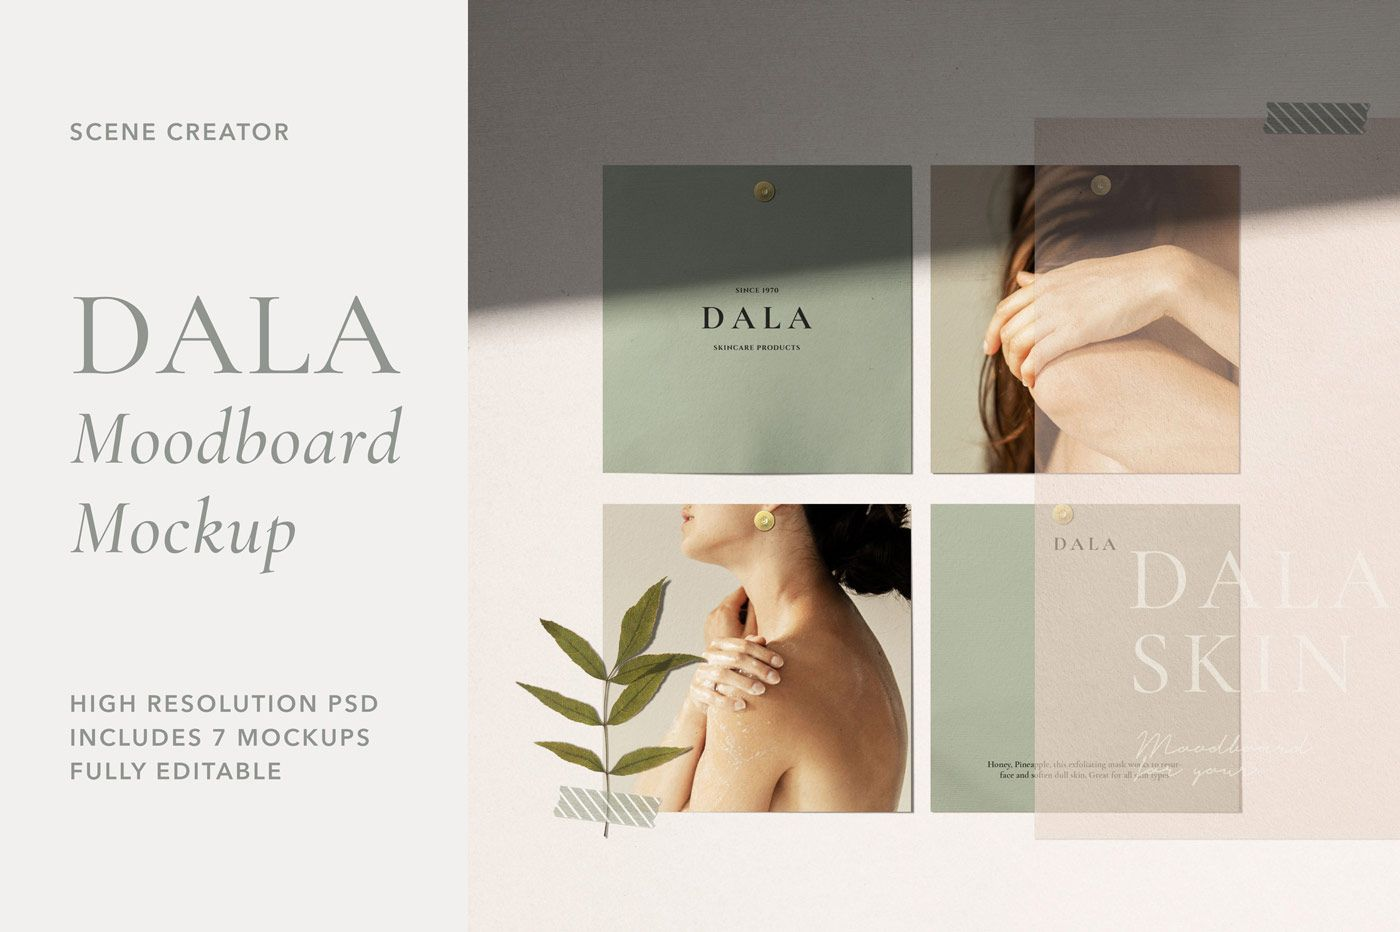 Dala - Moodboard Scene Creator | Sparrow and Snow